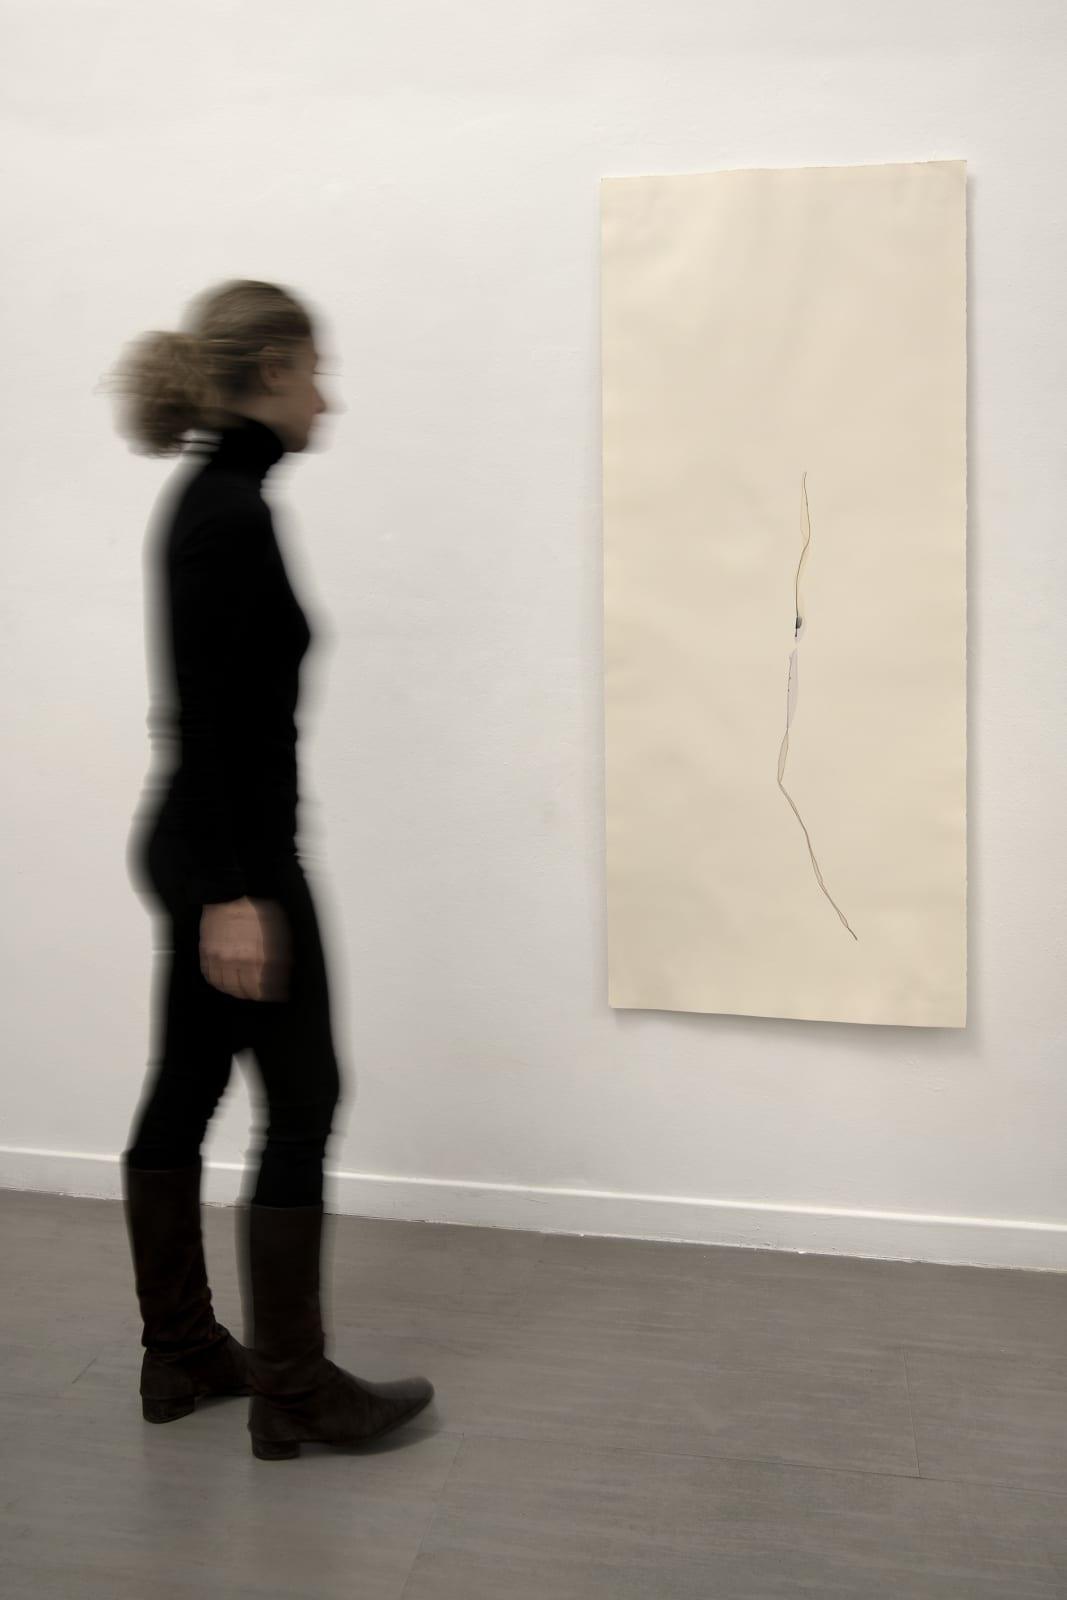 Beatrice Pediconi Untitled #24, 2020 Emulsion lift on paper cm 160 x 65